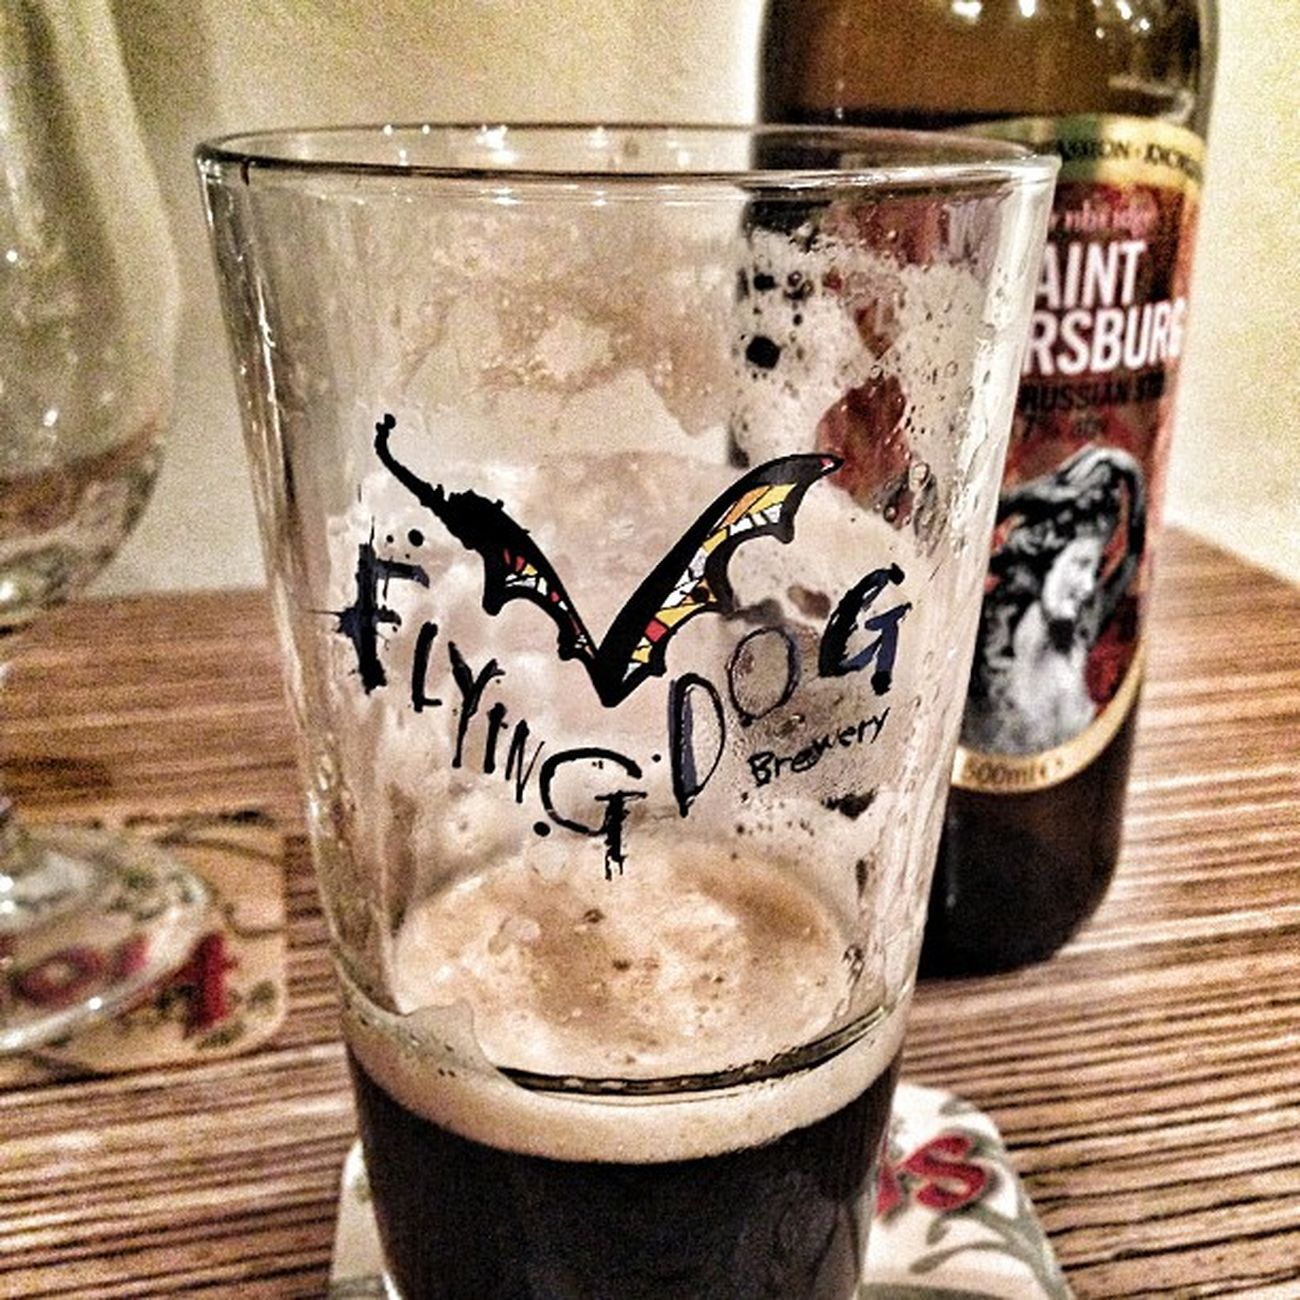 Pure il bicchiere era carino :) Birrarium Saintpetersburg Stout